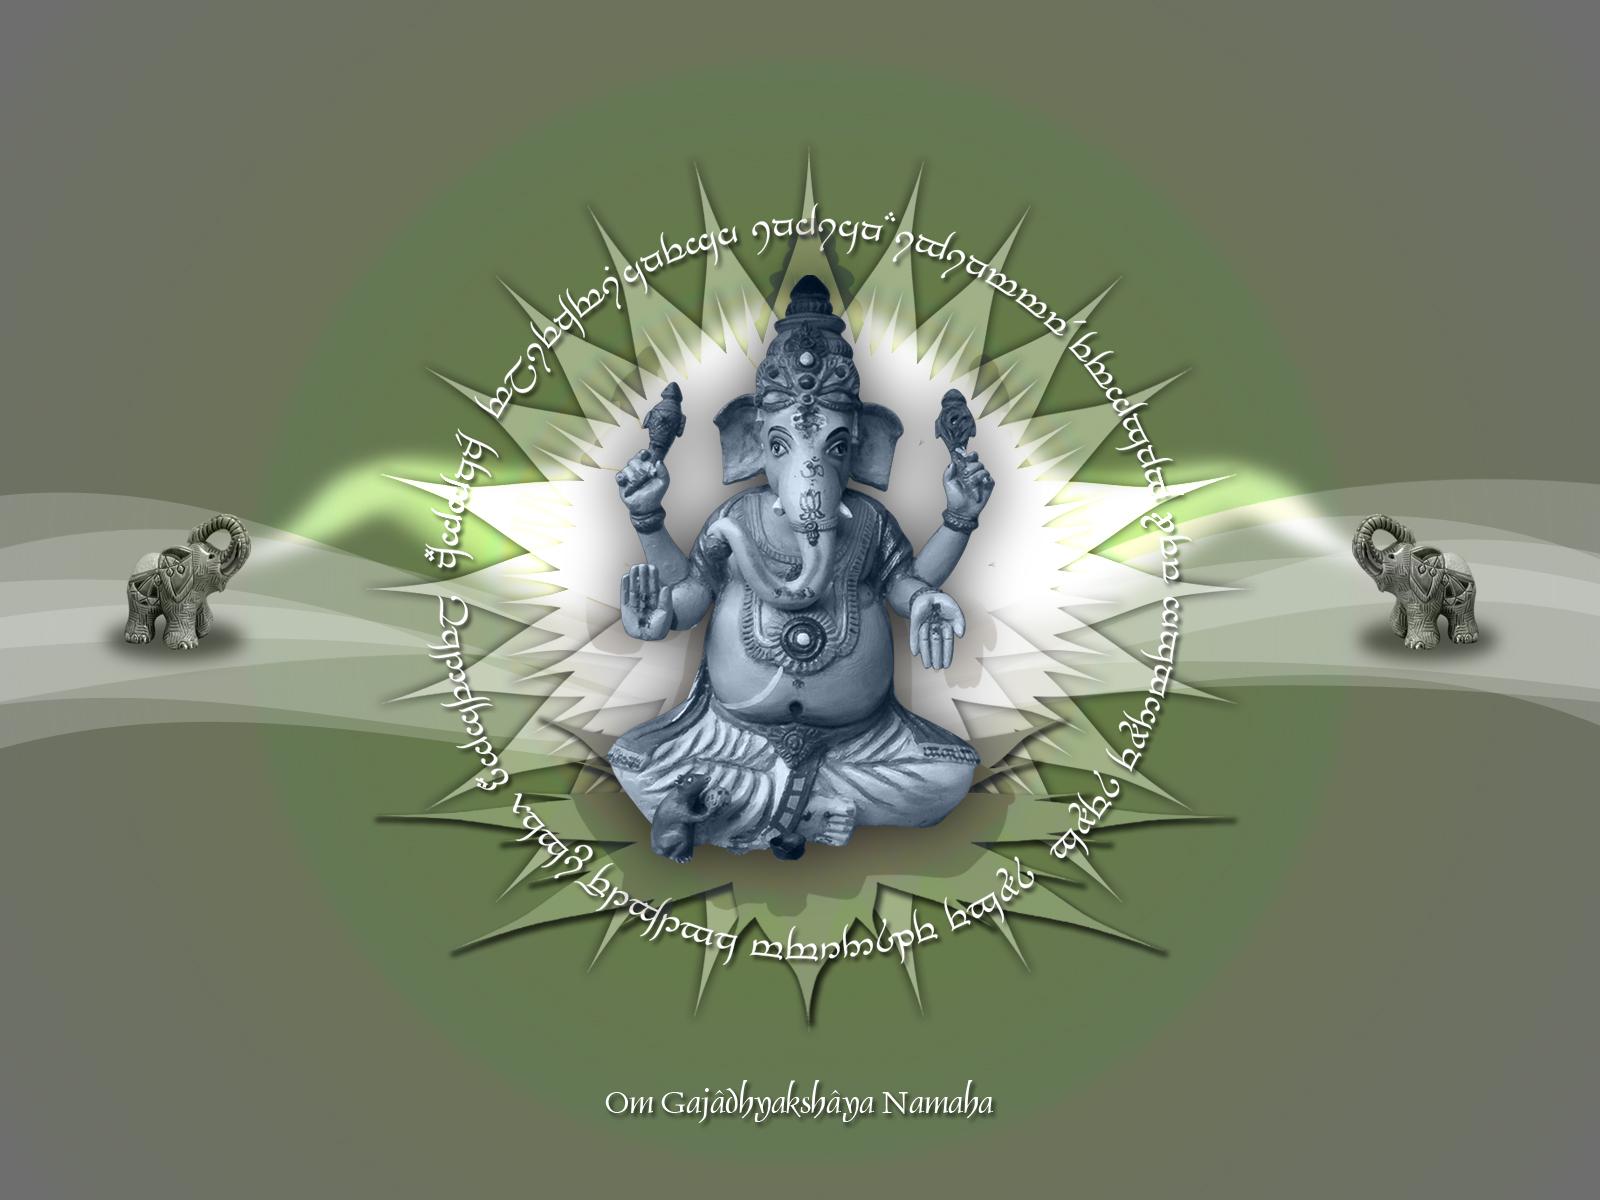 http://3.bp.blogspot.com/-oeIS5Hmadb4/Tl8ATAsAz4I/AAAAAAAACso/jQMjX3wrZEg/s1600/lord_ganesha_hd_wallpapers_7.jpg